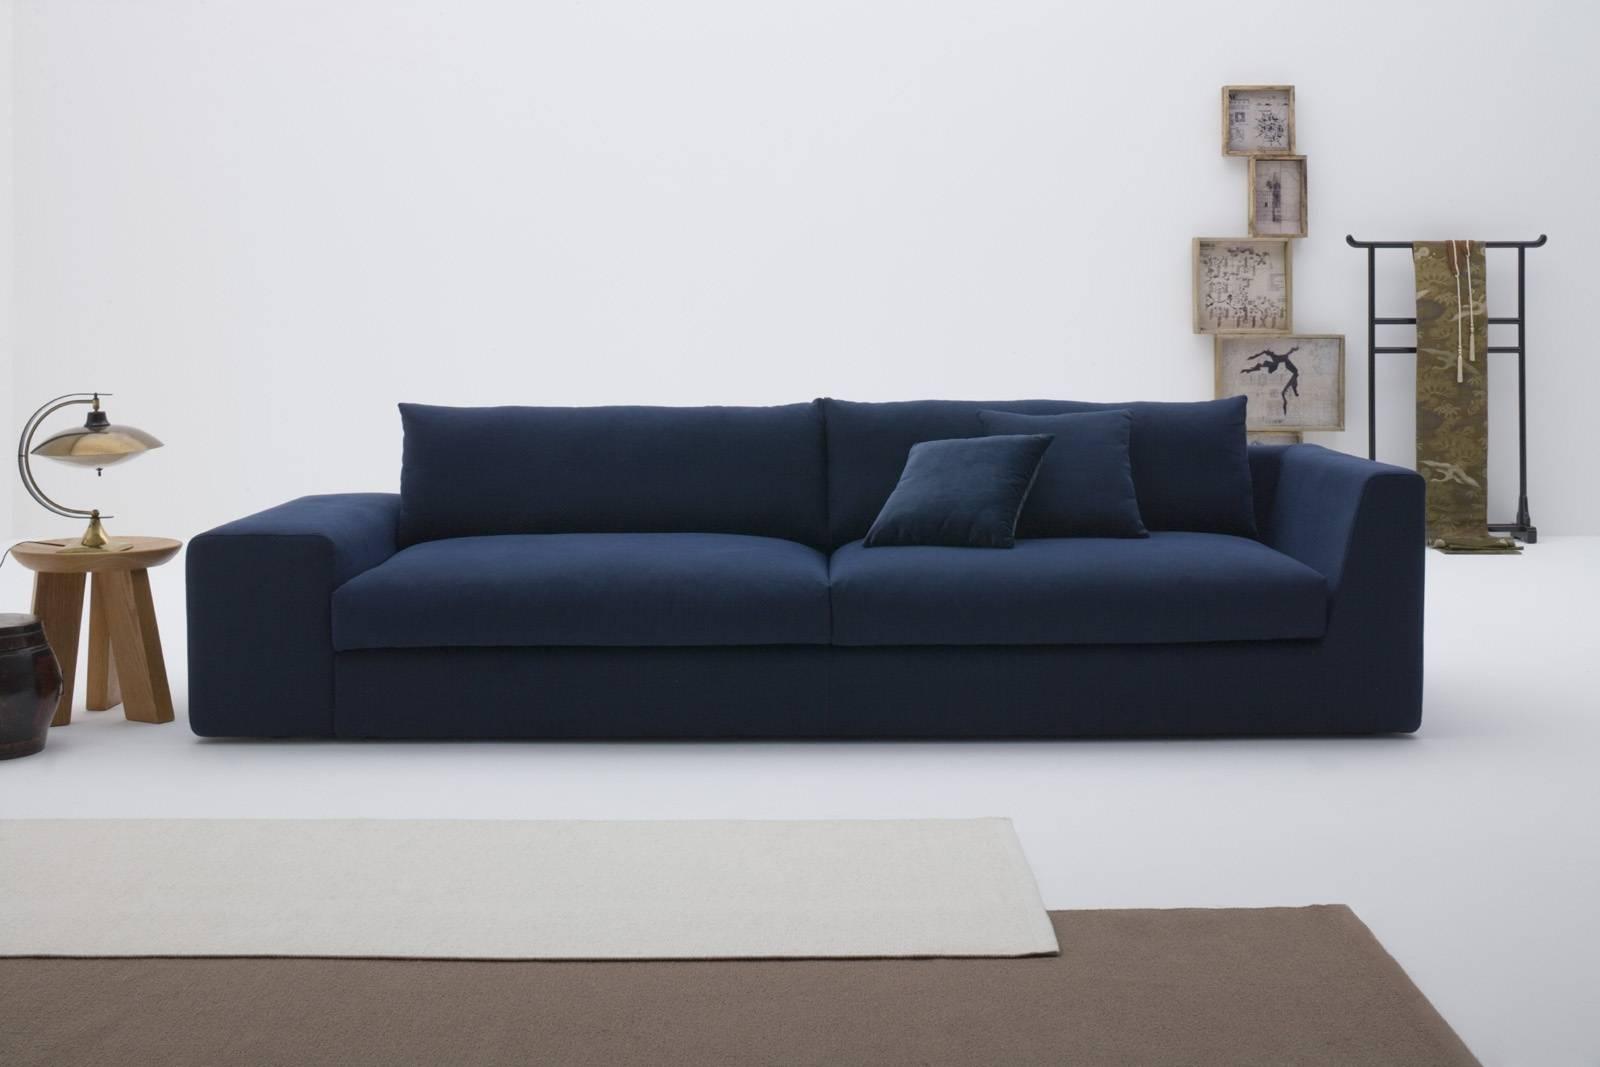 Modular Sofa Newport, Alberta Salotti - Luxury Furniture Mr within Newport Sofas (Image 10 of 30)